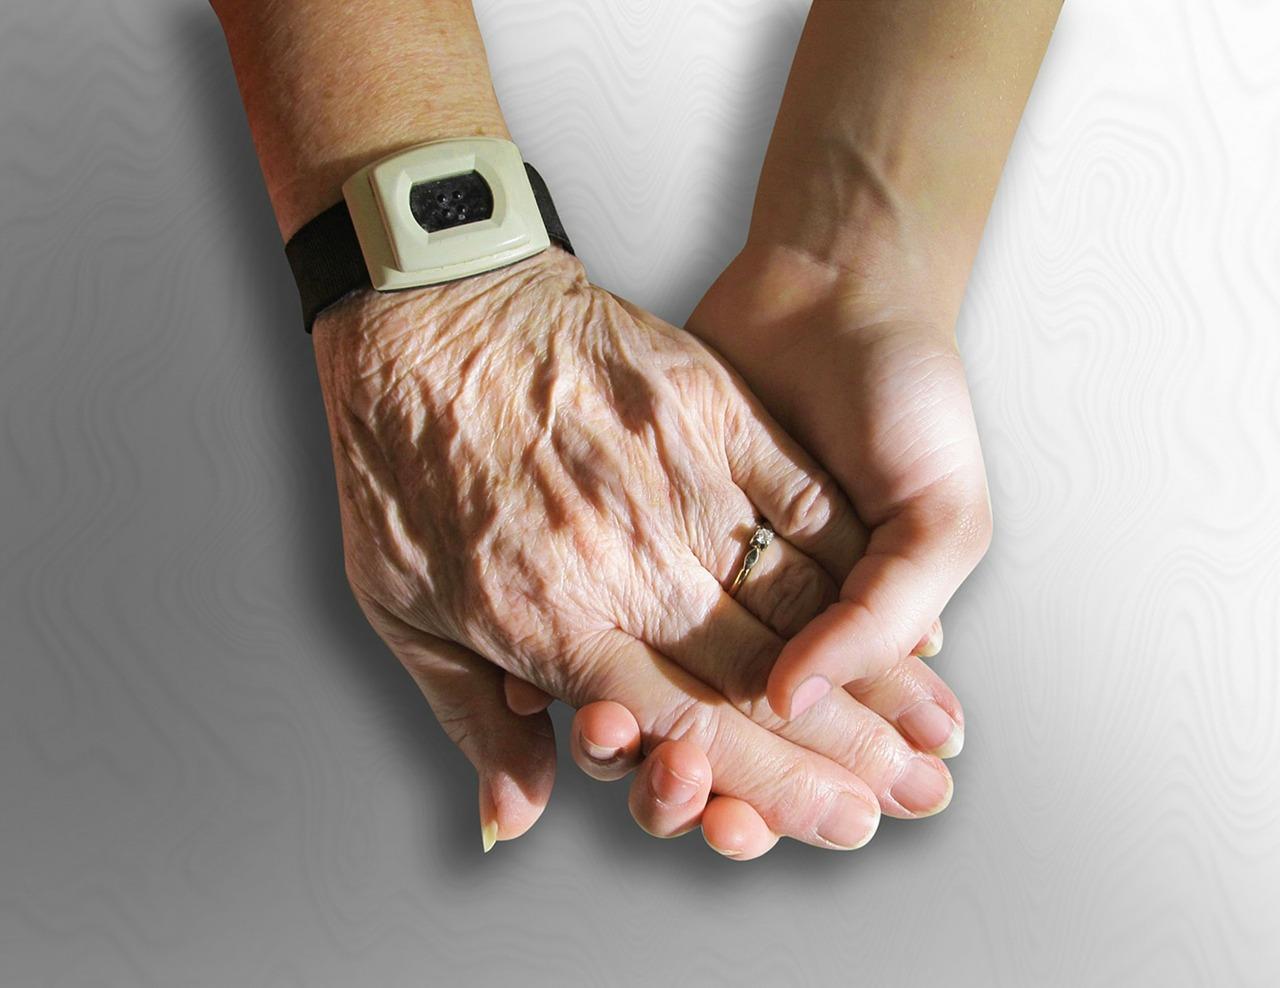 Therapitylino blog on baby boomers